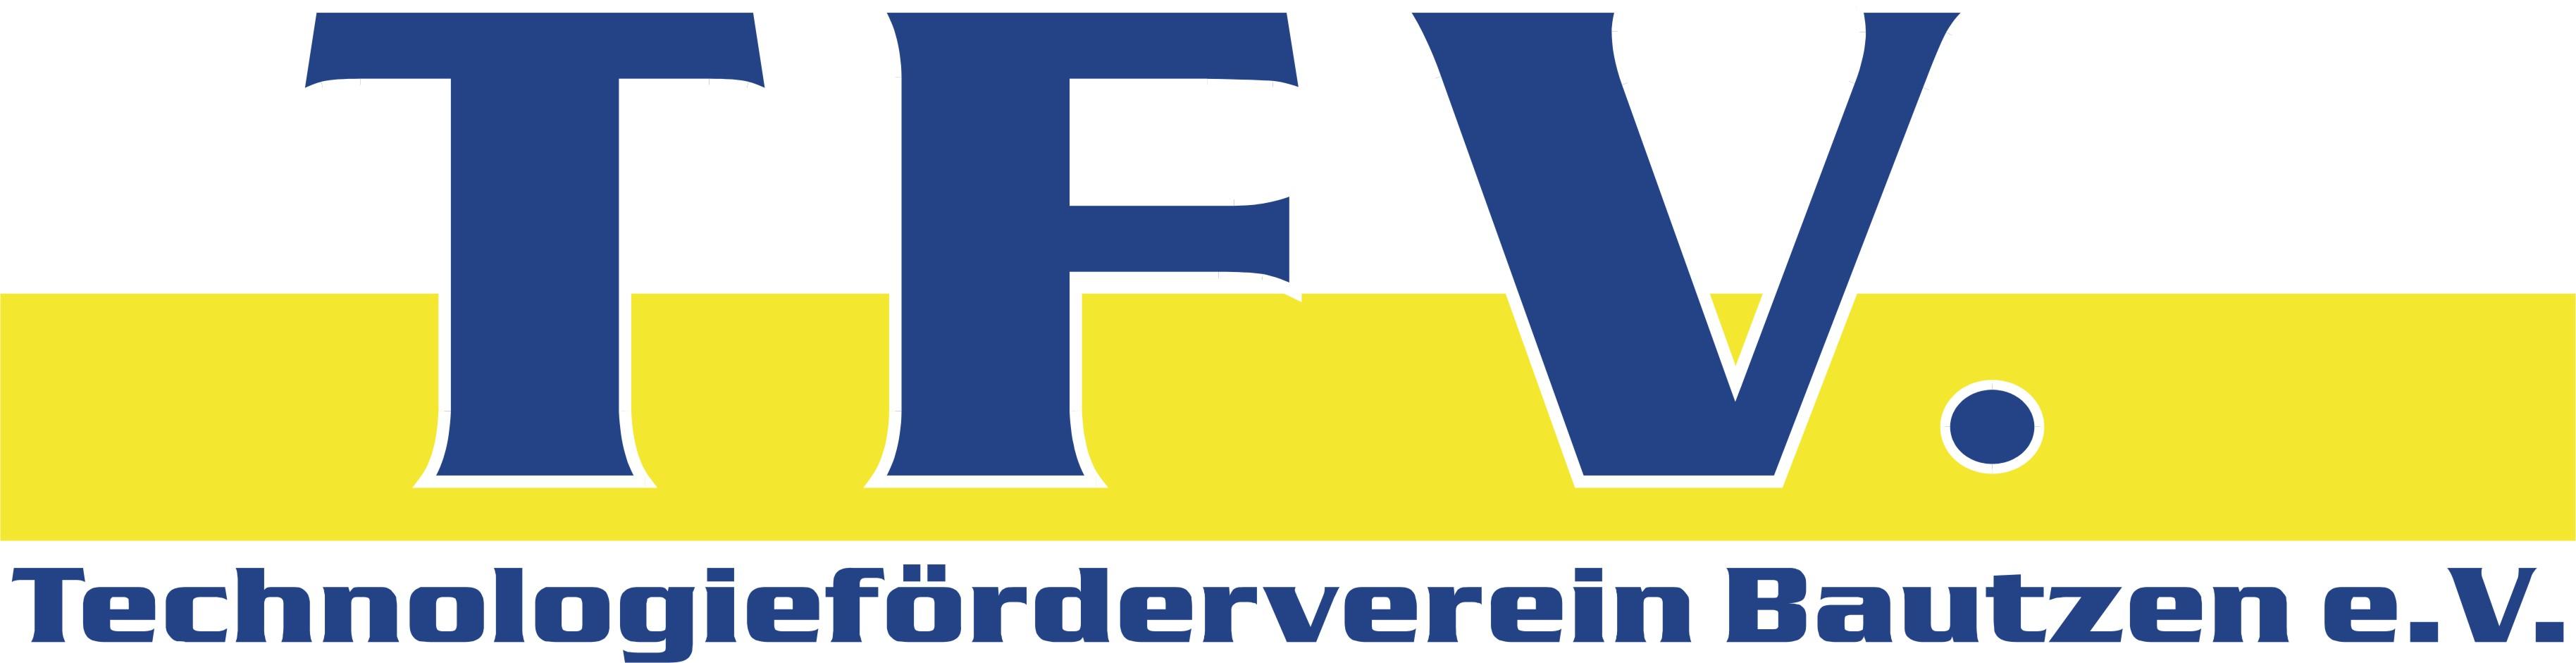 logo technologieförderverein bautzen e.v.